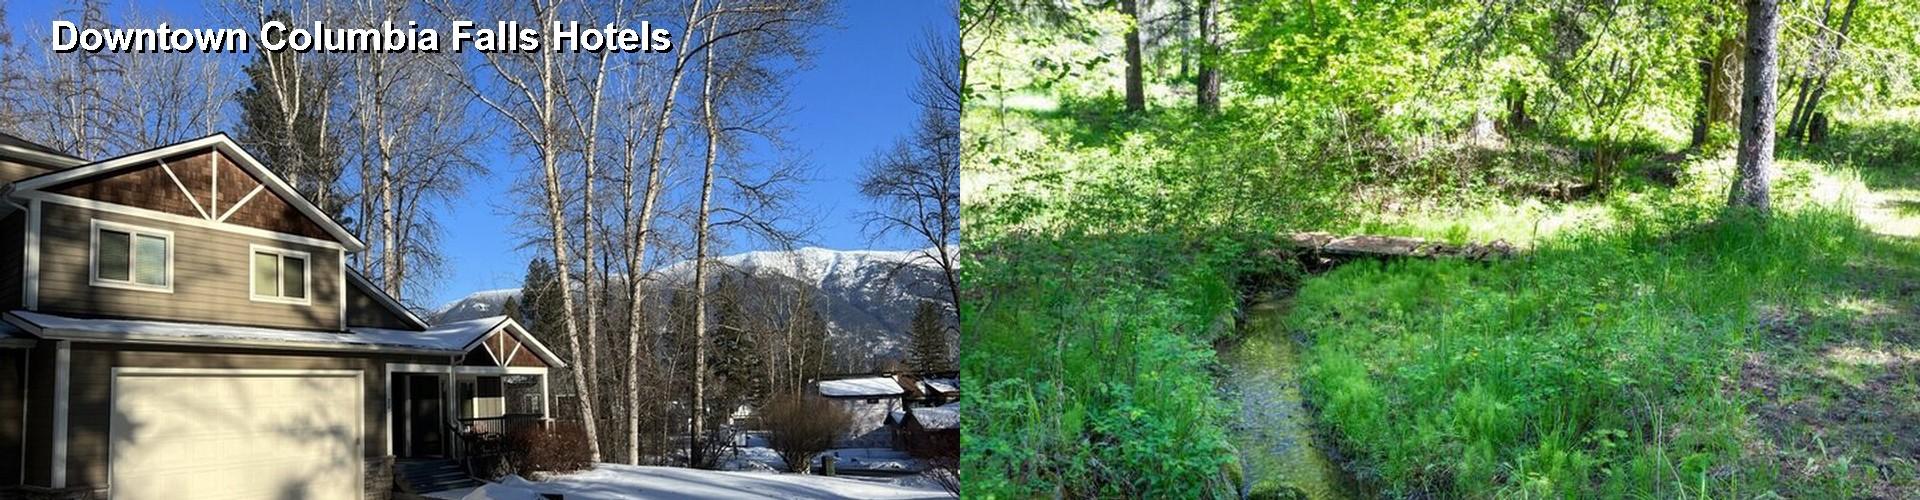 5 Best Hotels Near Downtown Columbia Falls